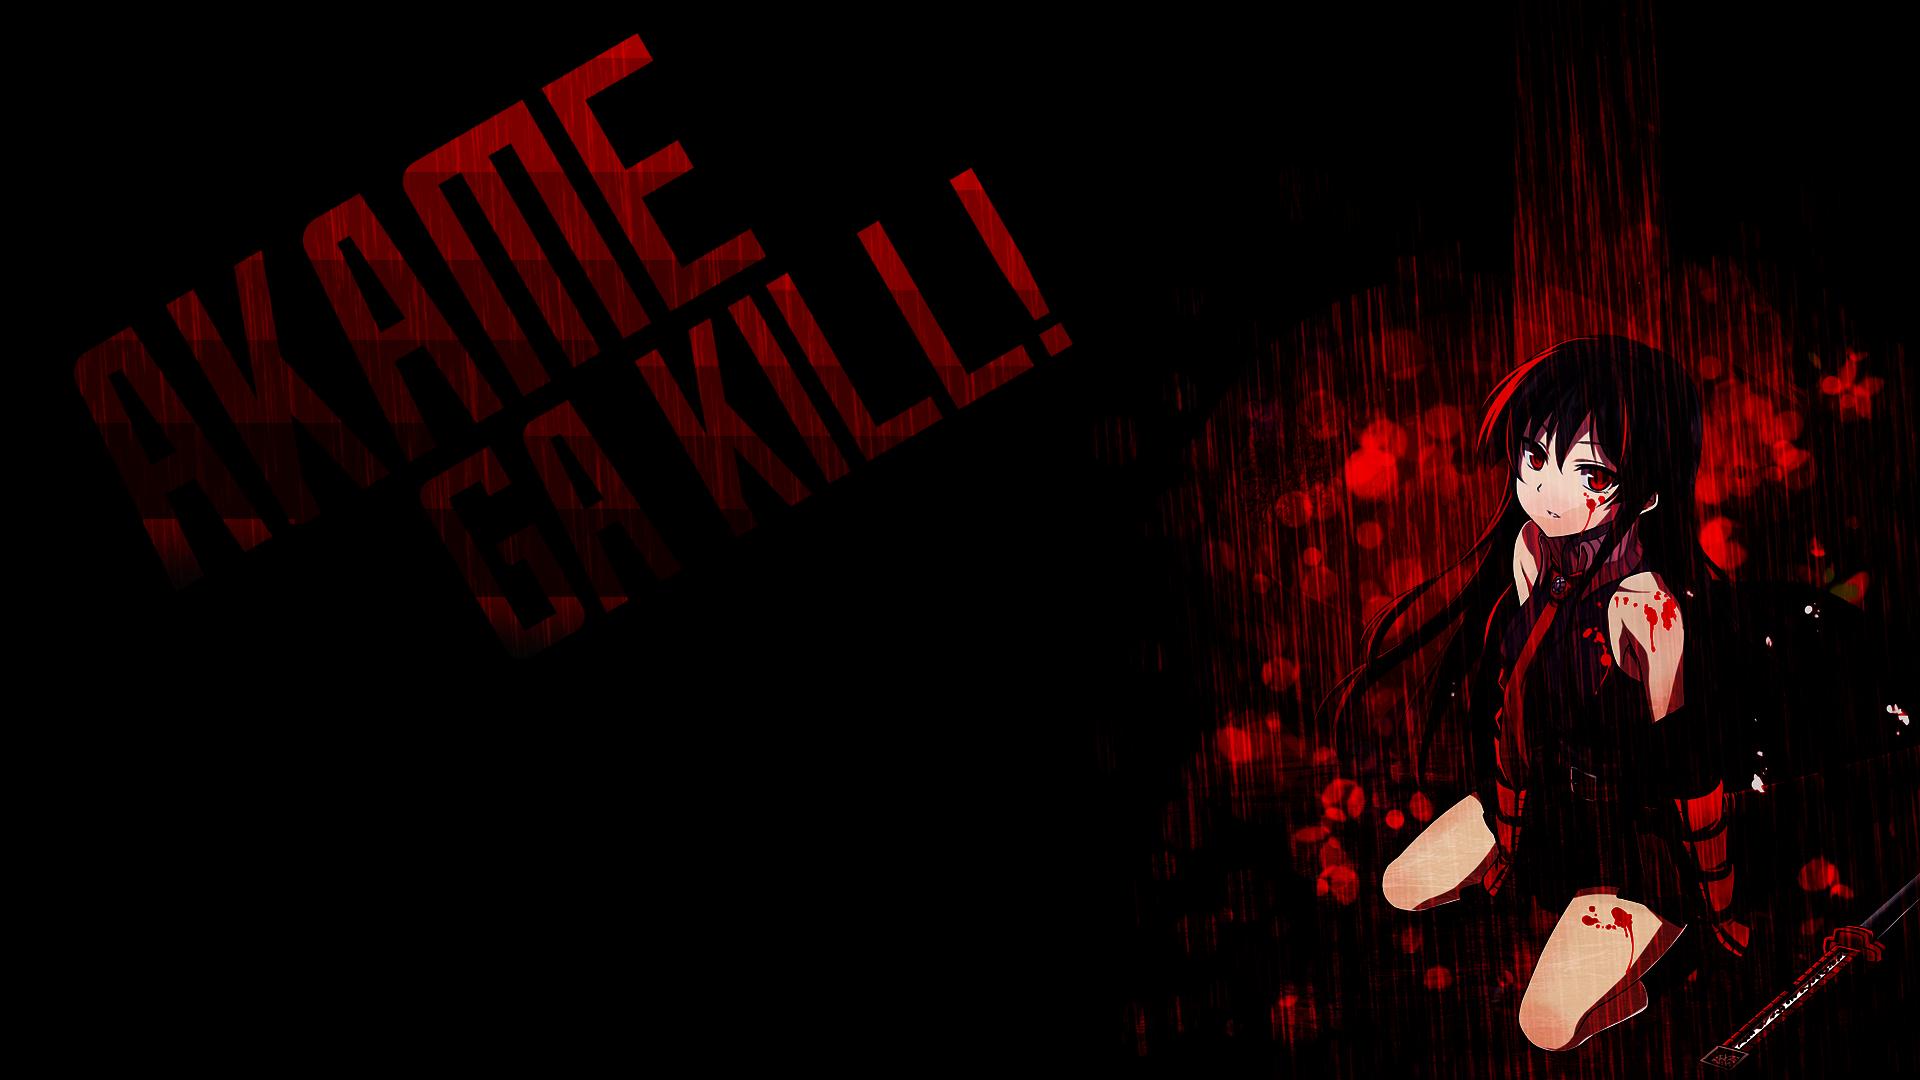 how to pronounce akame ga kill